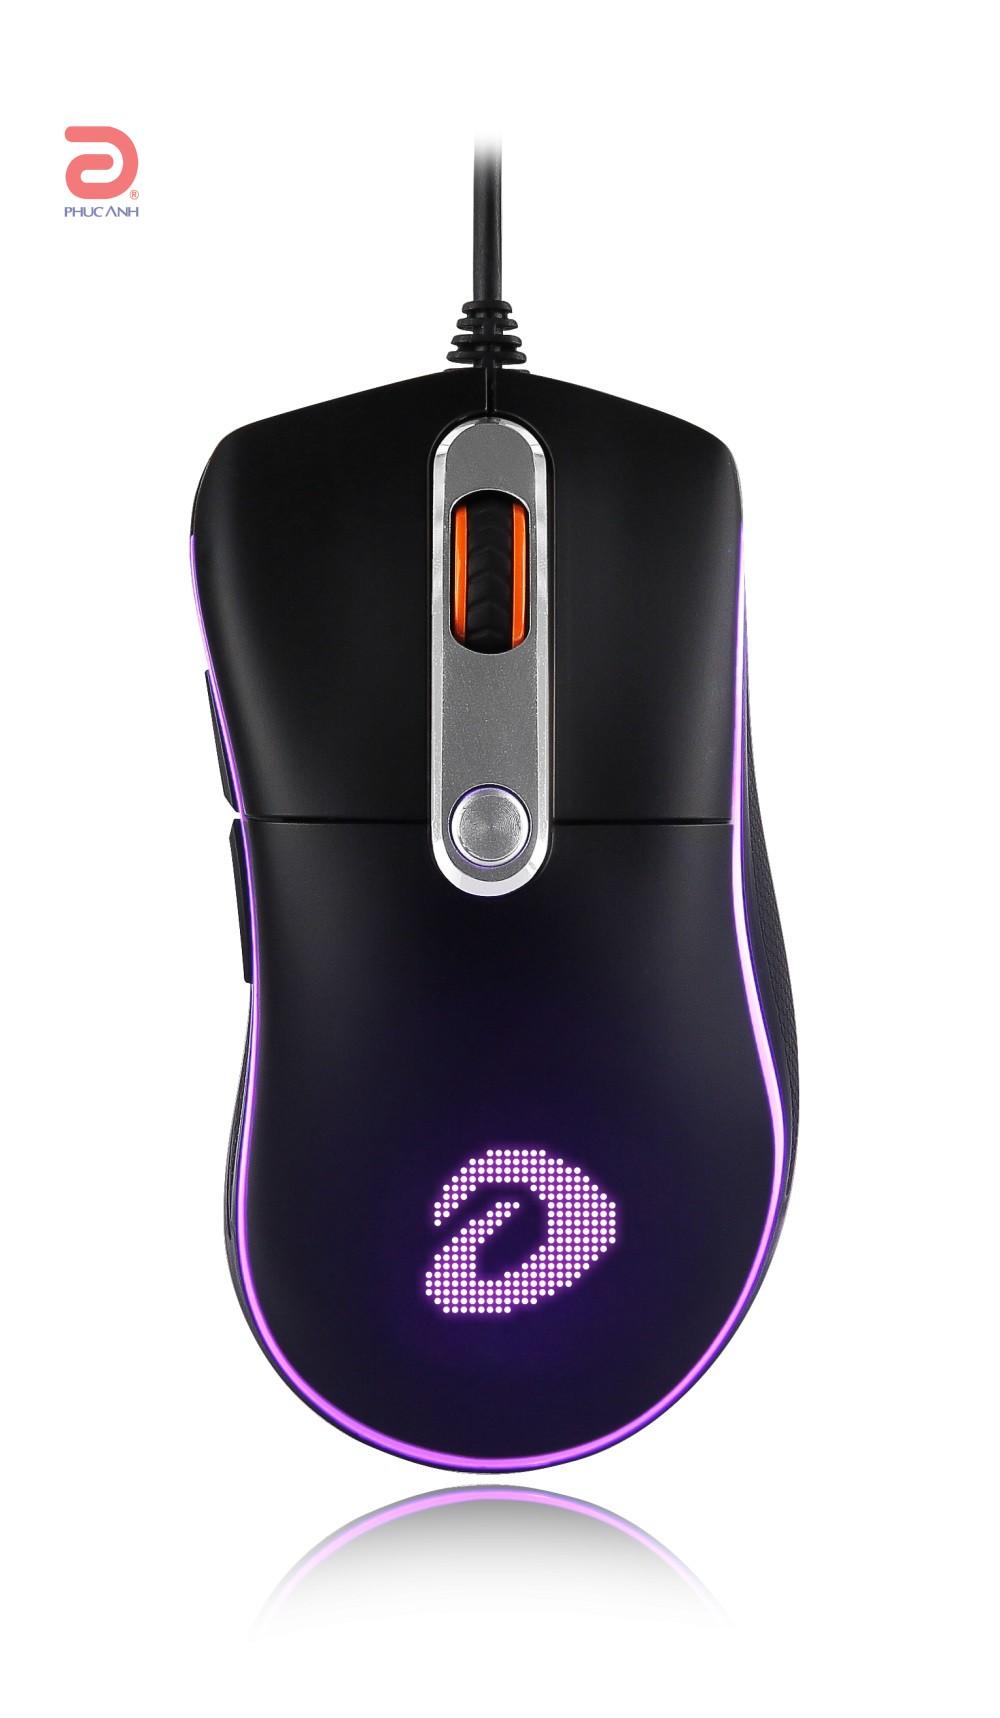 Chuột Dareu S100 (LED RGB) (USB)